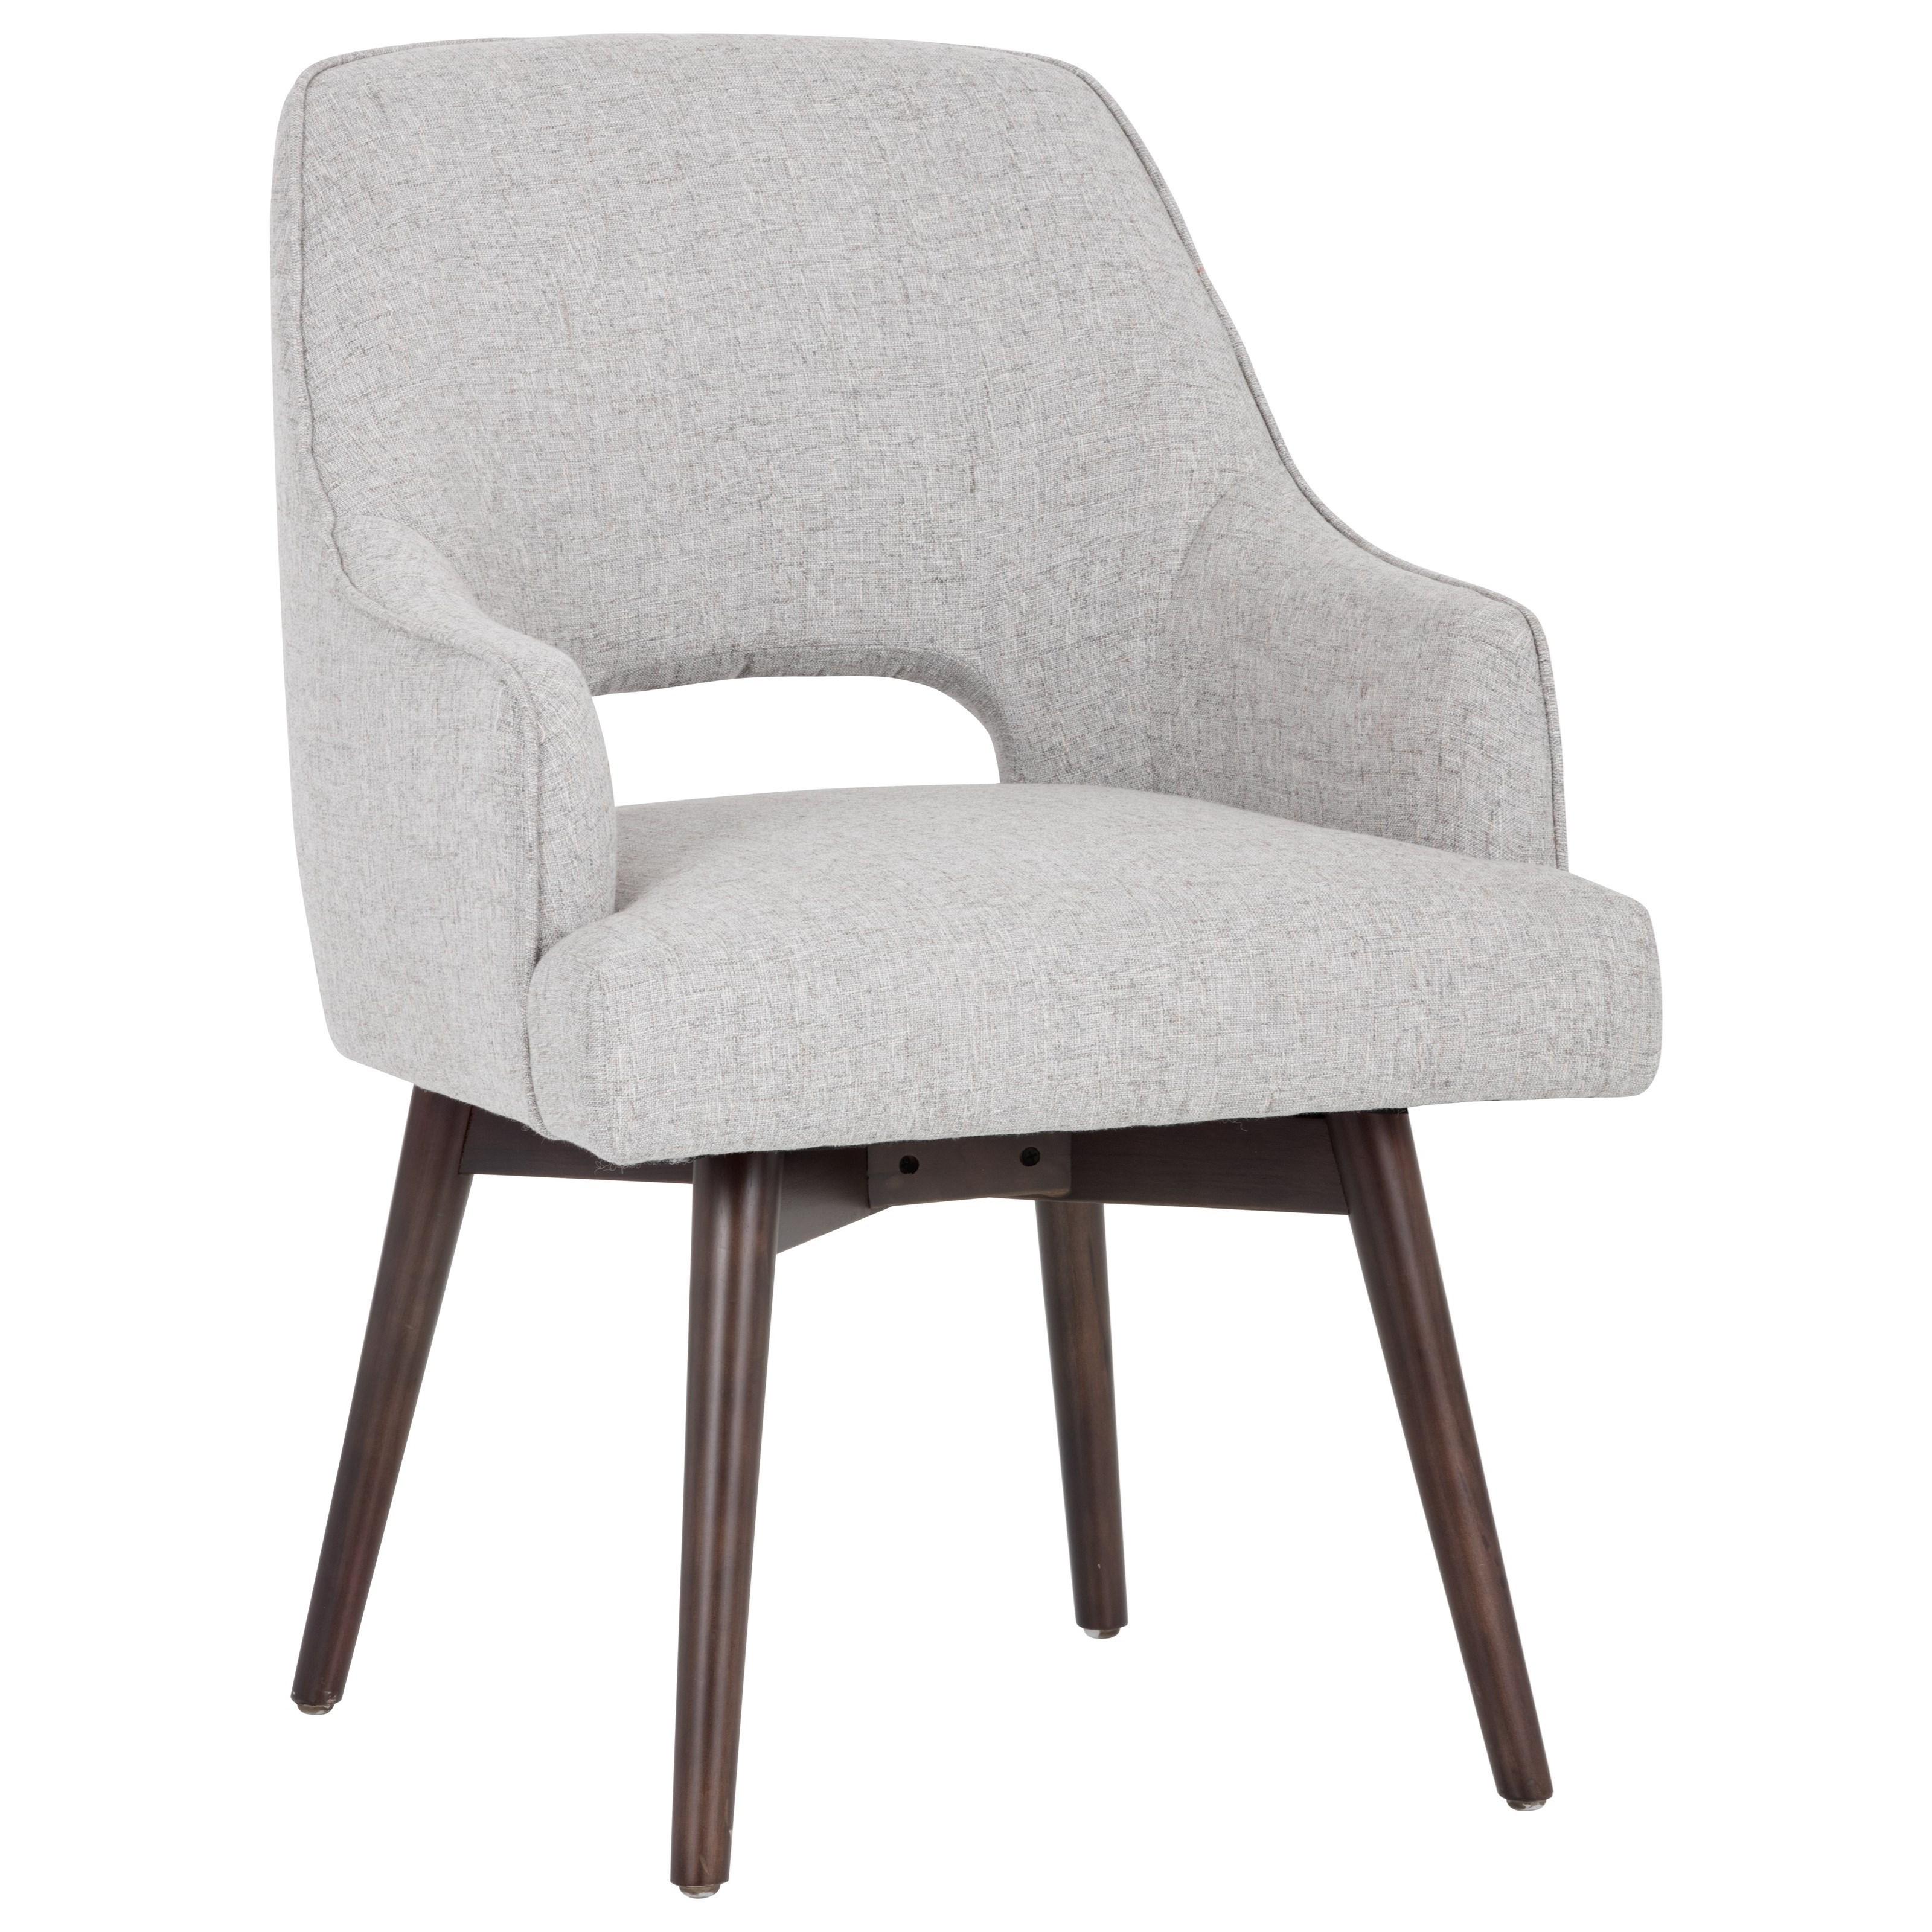 5West Newton Swivel Armchair by Sunpan Imports at Reid's Furniture